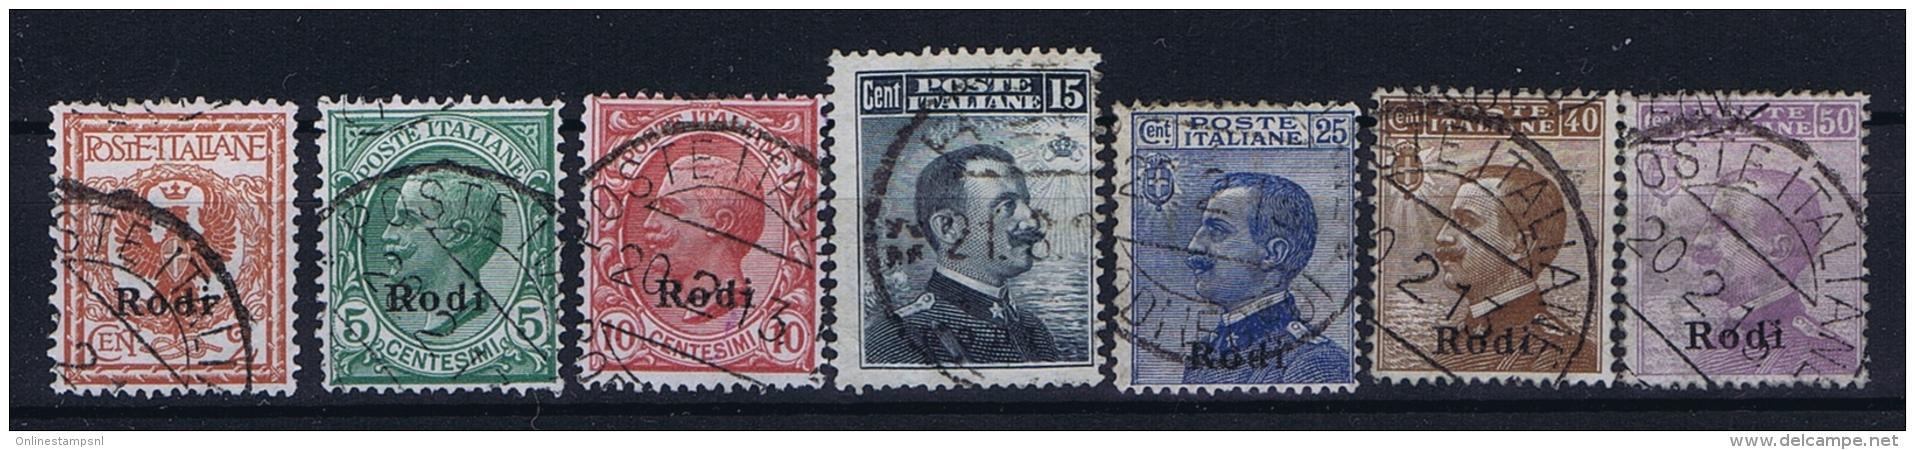 Italy: Rodi  Sa  1 - 7  Mi Nr 3 - 9 Used Obl.  1912  25 C Has A Fold - Ägäis (Rodi)